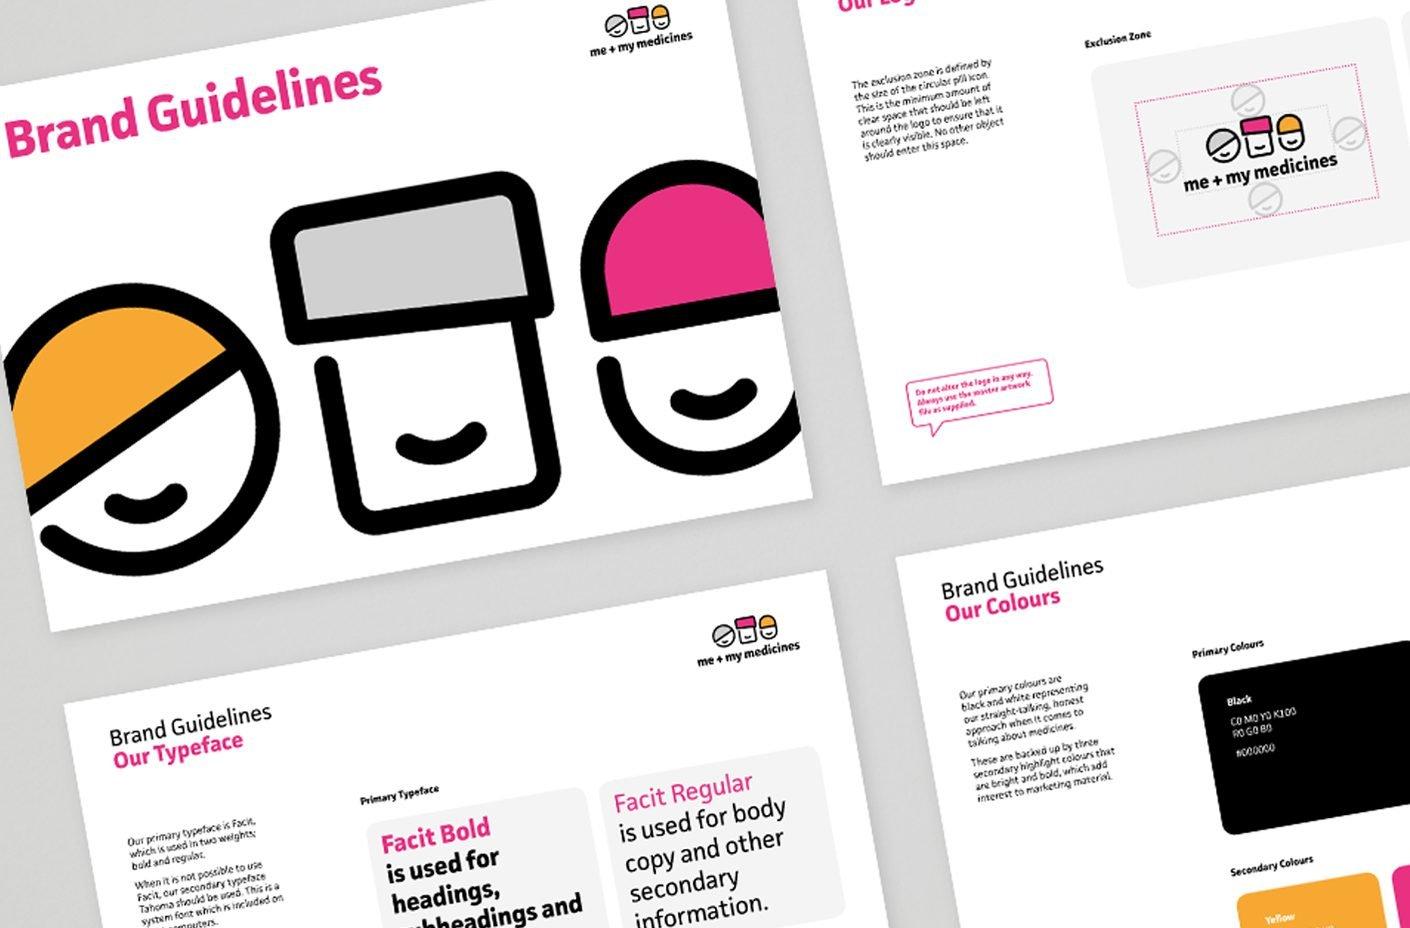 Me + My Medicines Brand Guidelines